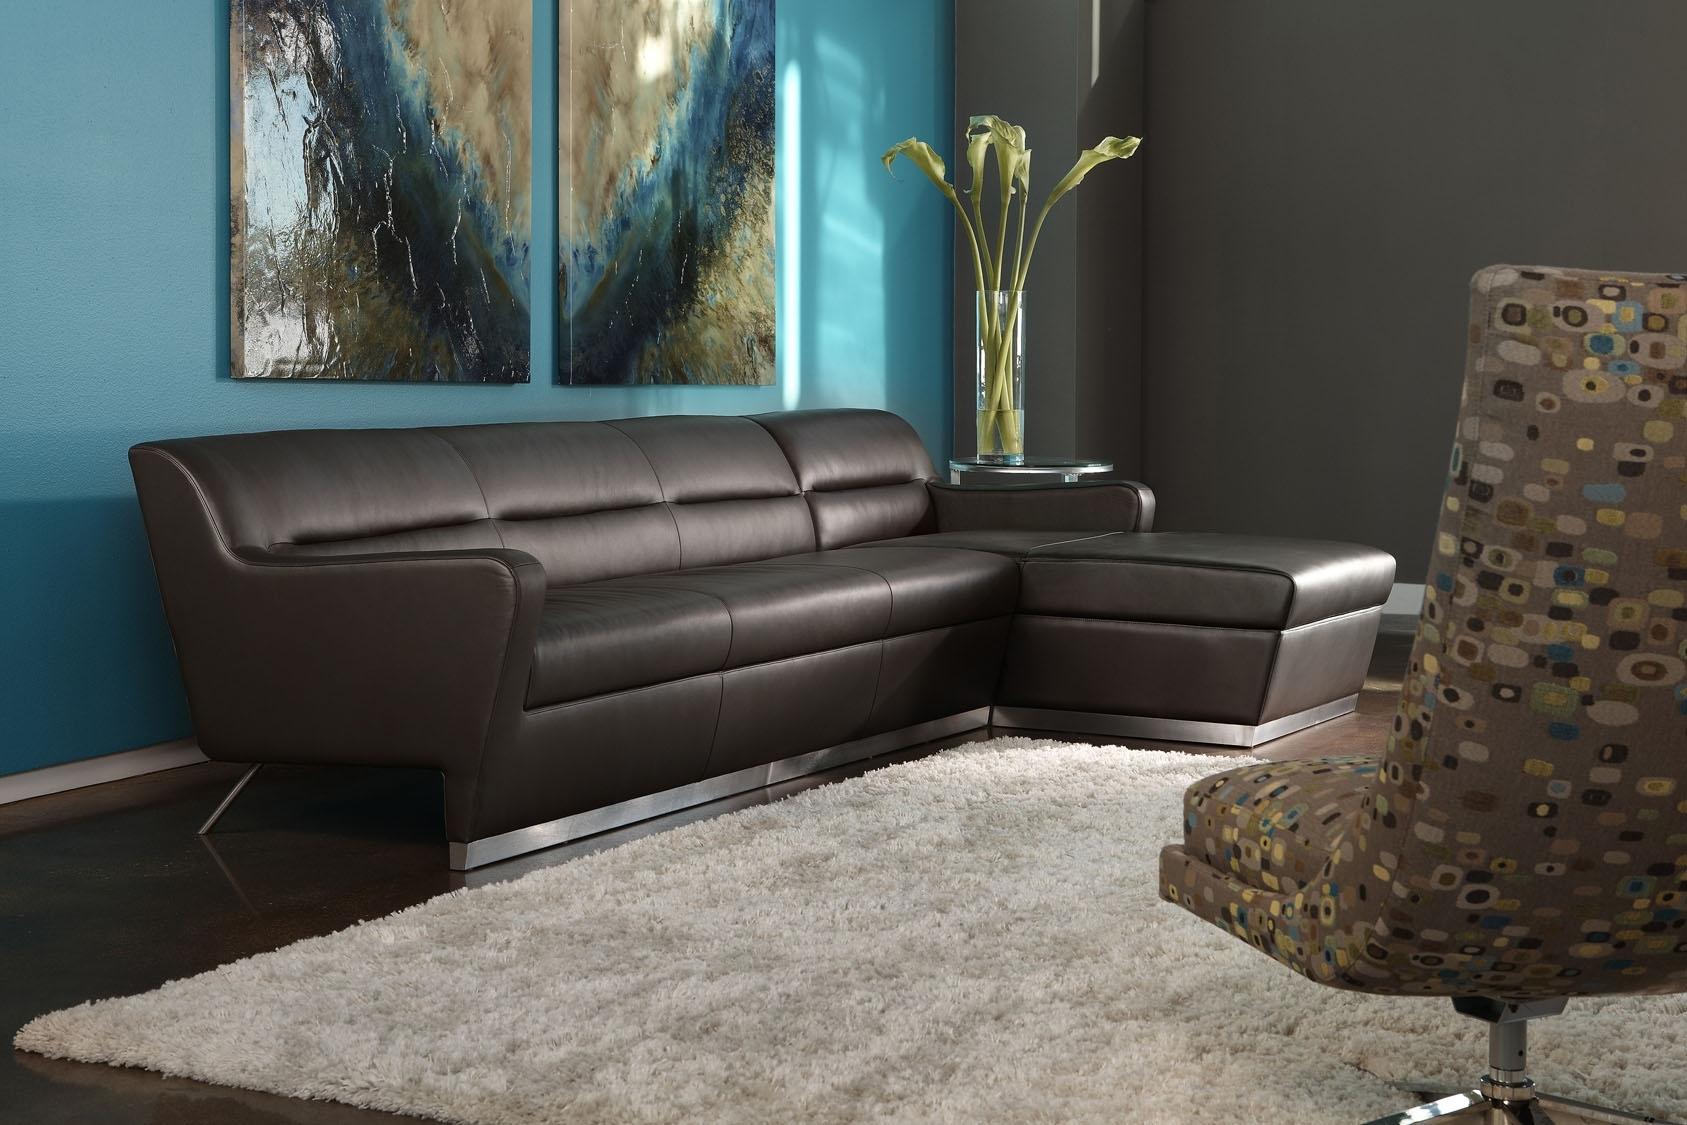 American Leather Niagara Sectional Sofa | Modern Furniture Throughout Niagara Sectional Sofas (Image 4 of 10)